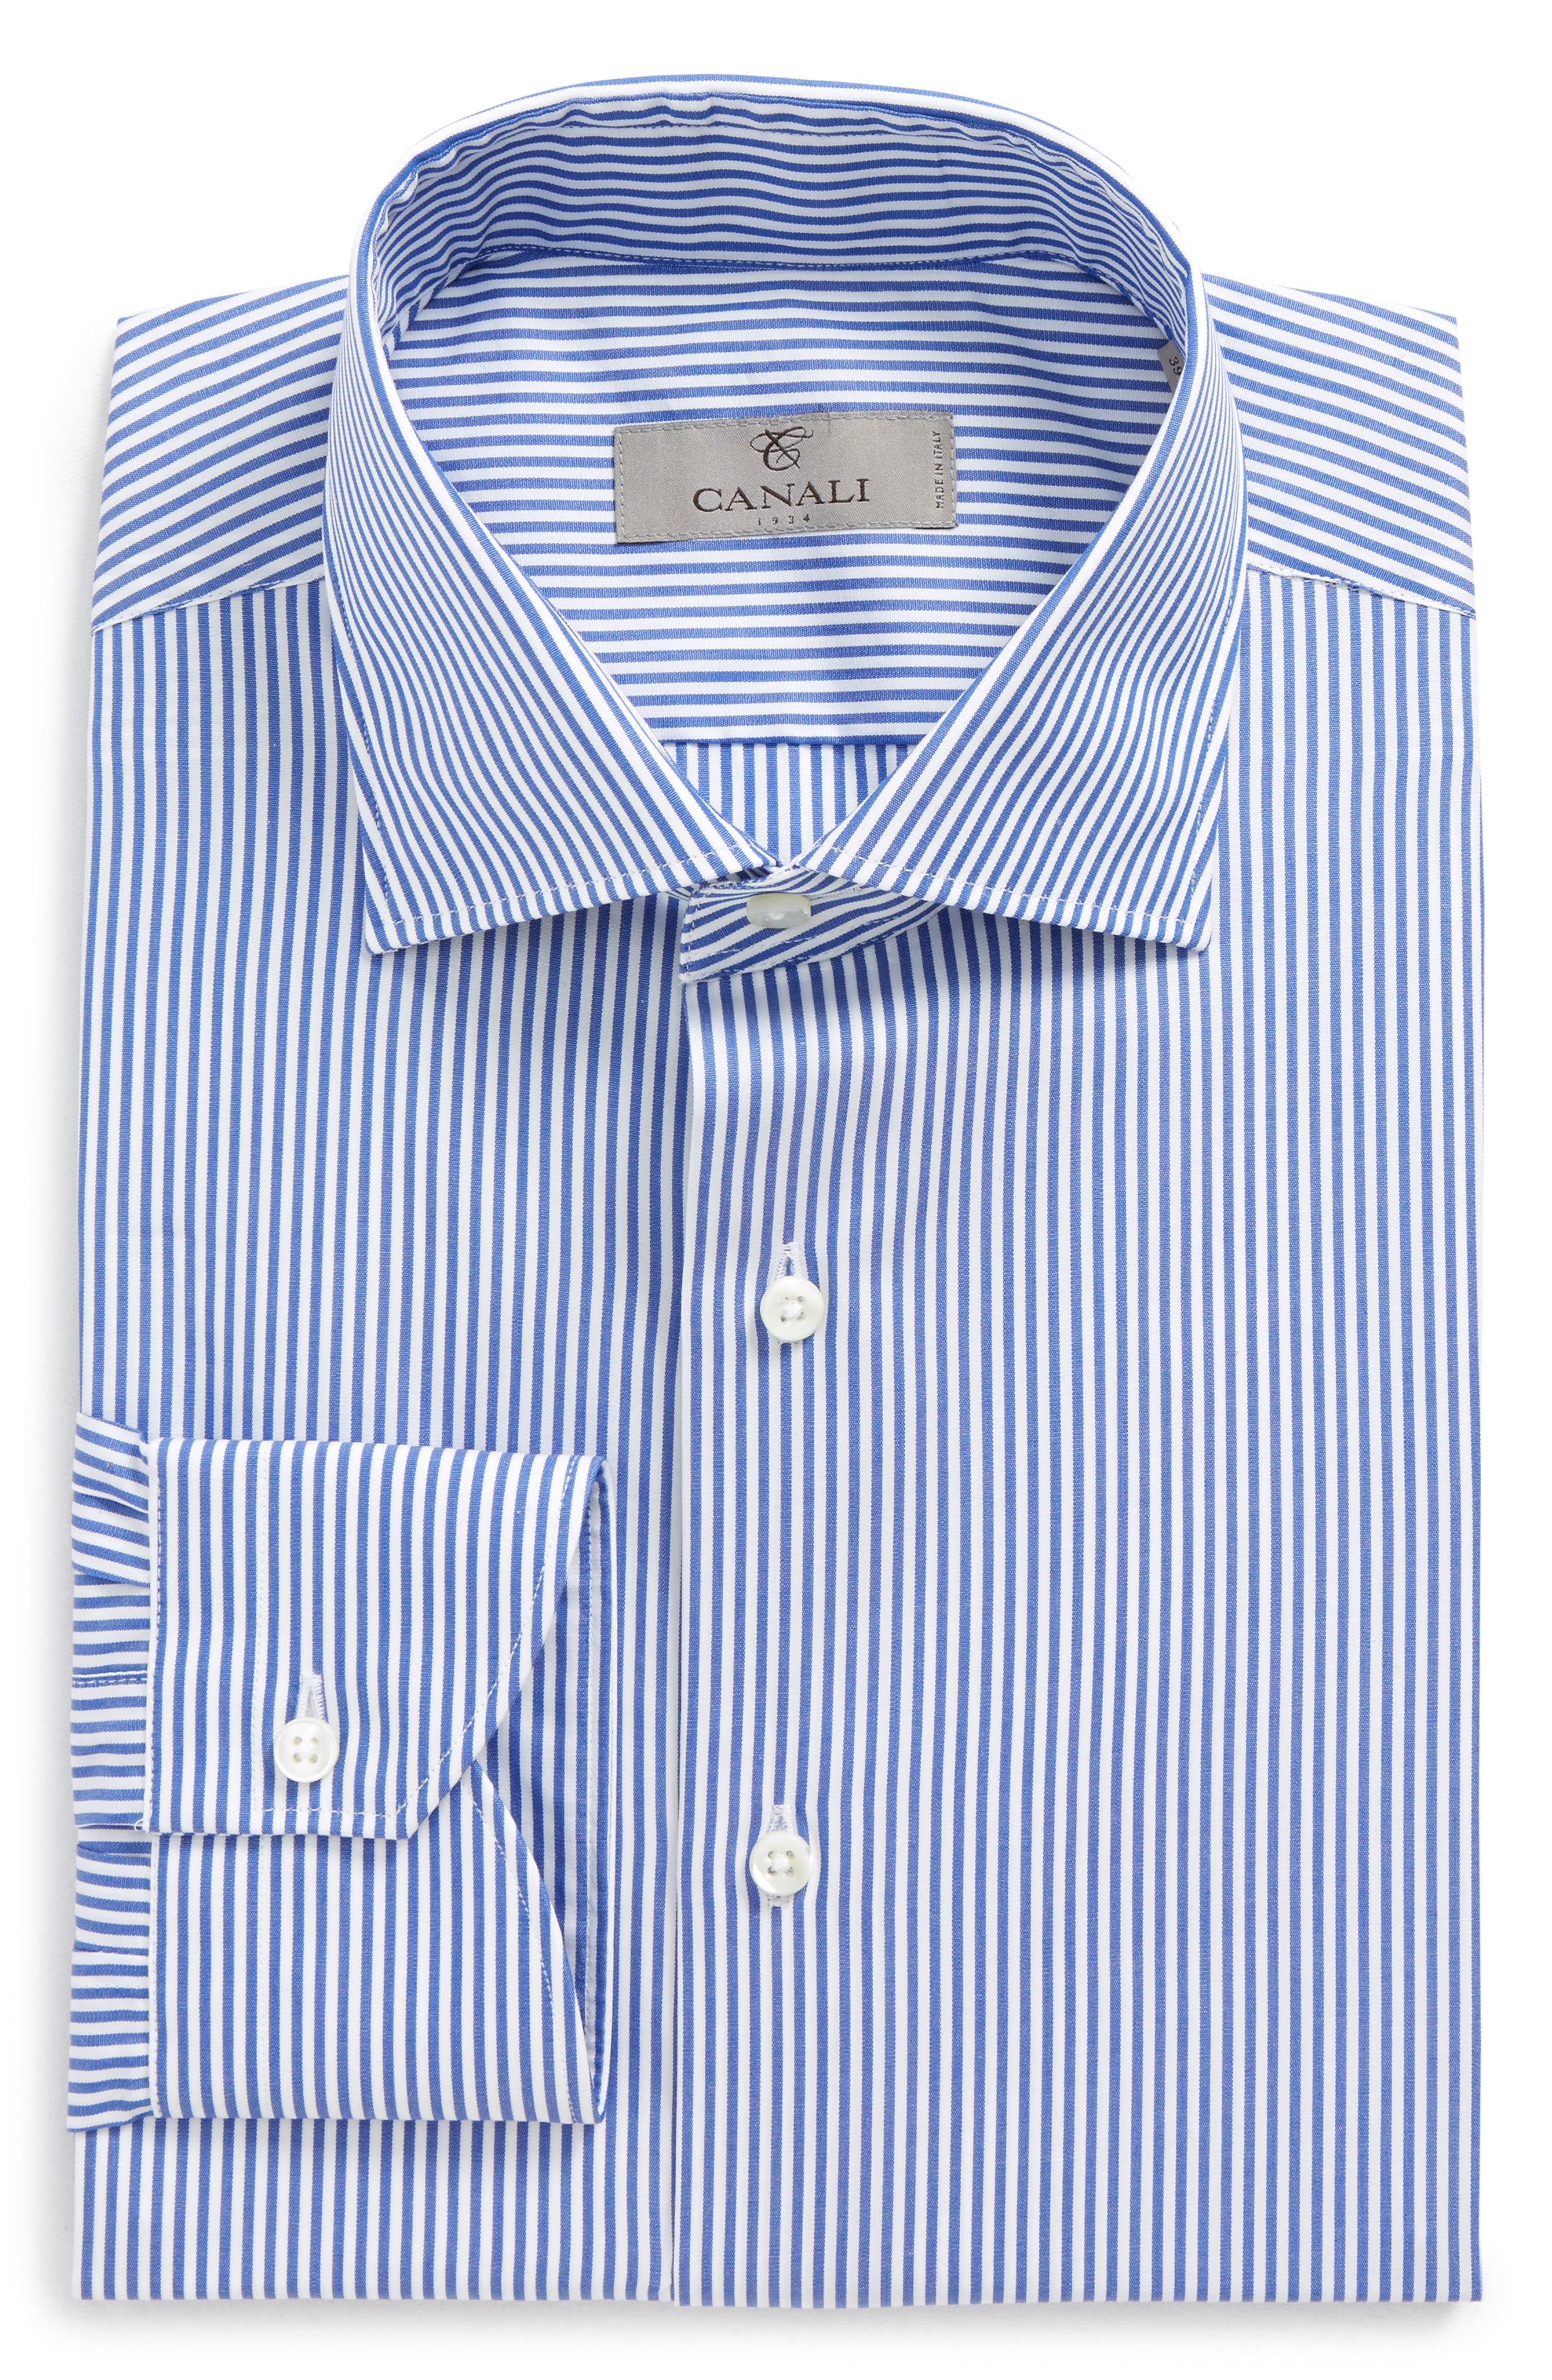 Regular Fit Stripe Dress Shirt,                             Main thumbnail 1, color,                             410